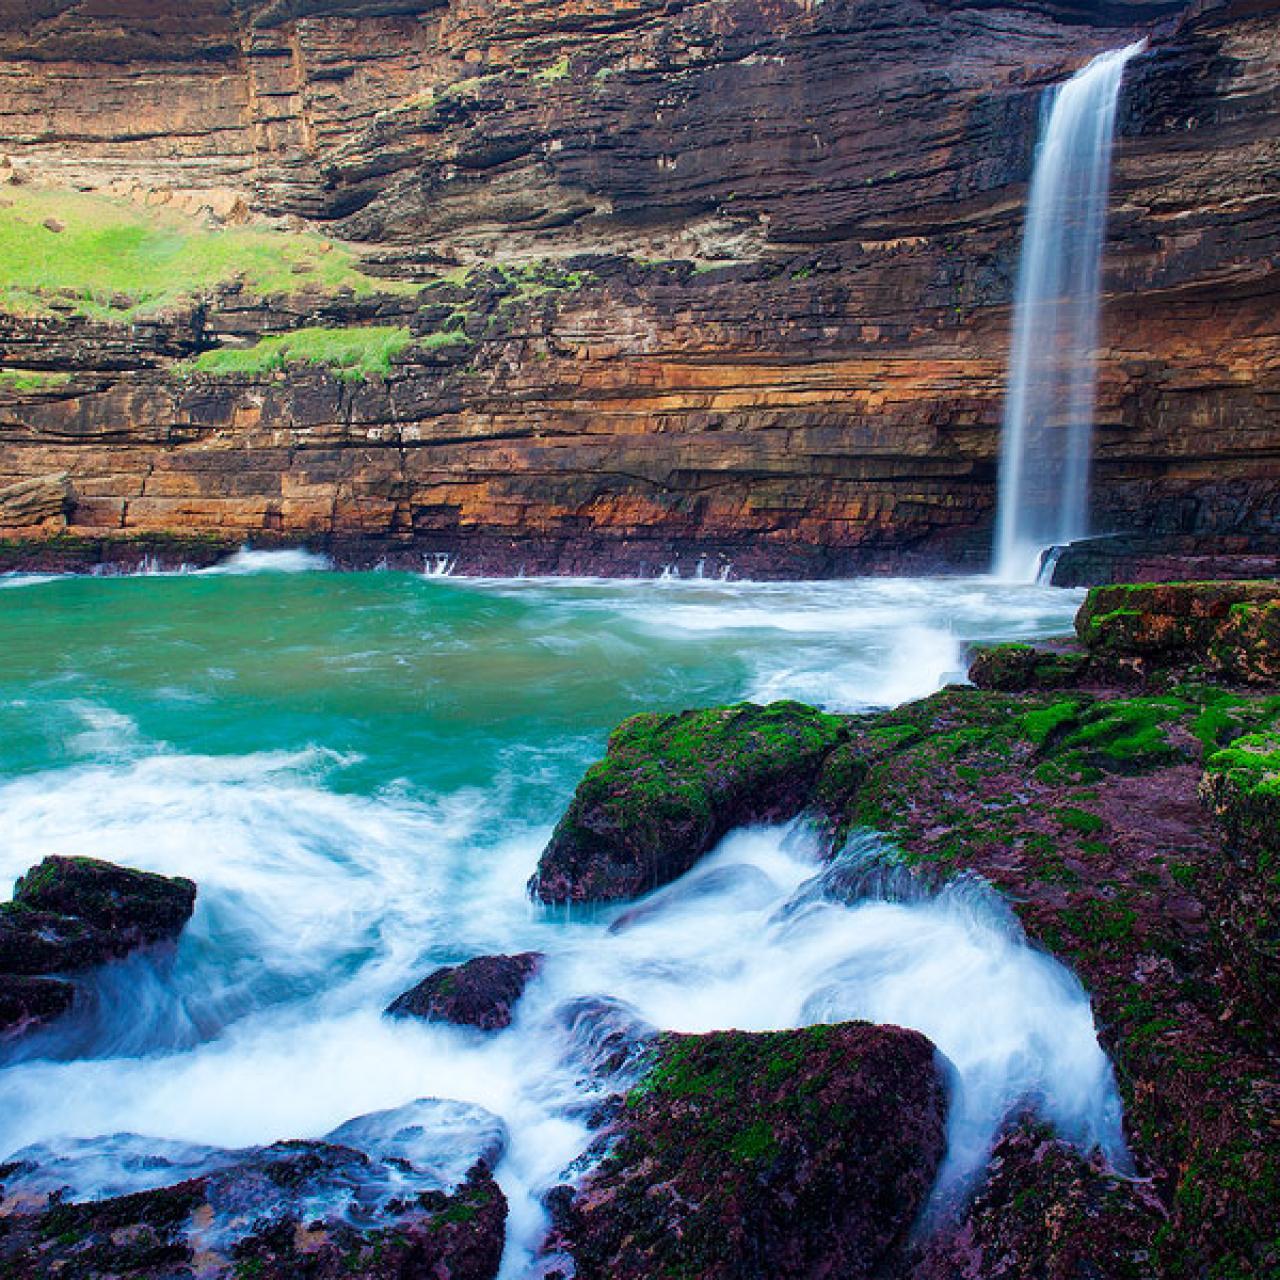 Waterfall Bluff - (c) Hougaard Malan